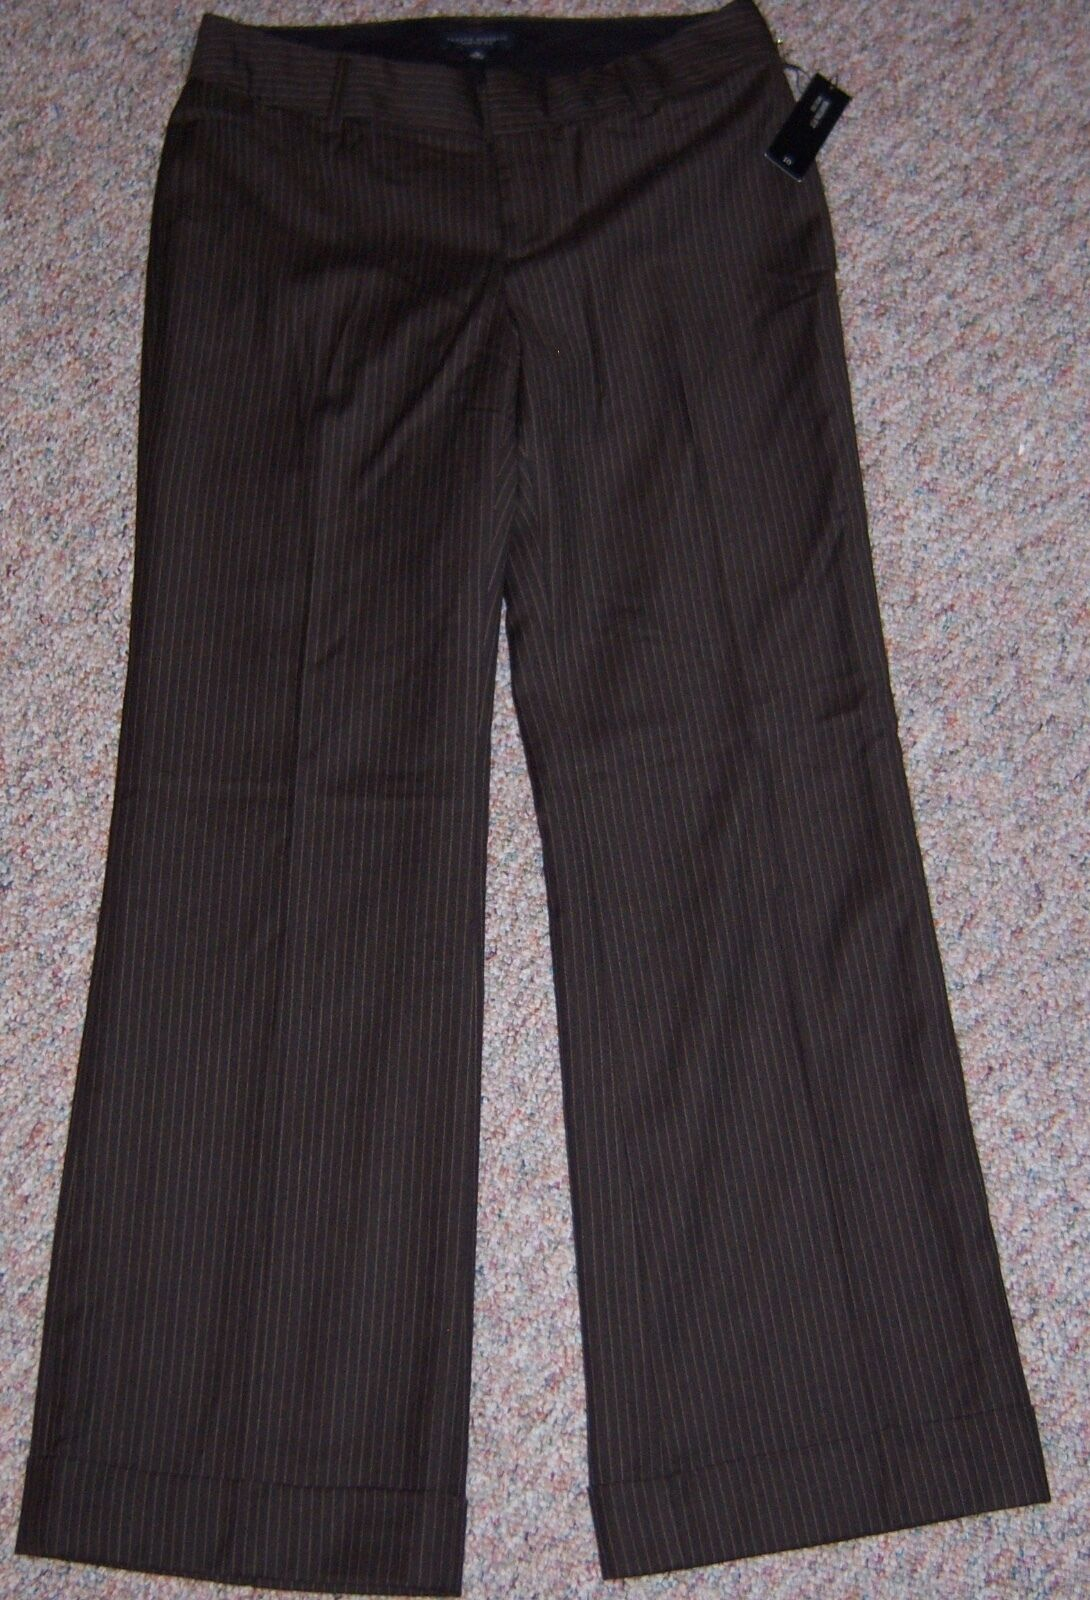 BANANA REPUBLIC Martin Fit Brown Striped Wide Leg Wool Dress Pants Cuffs Size 10